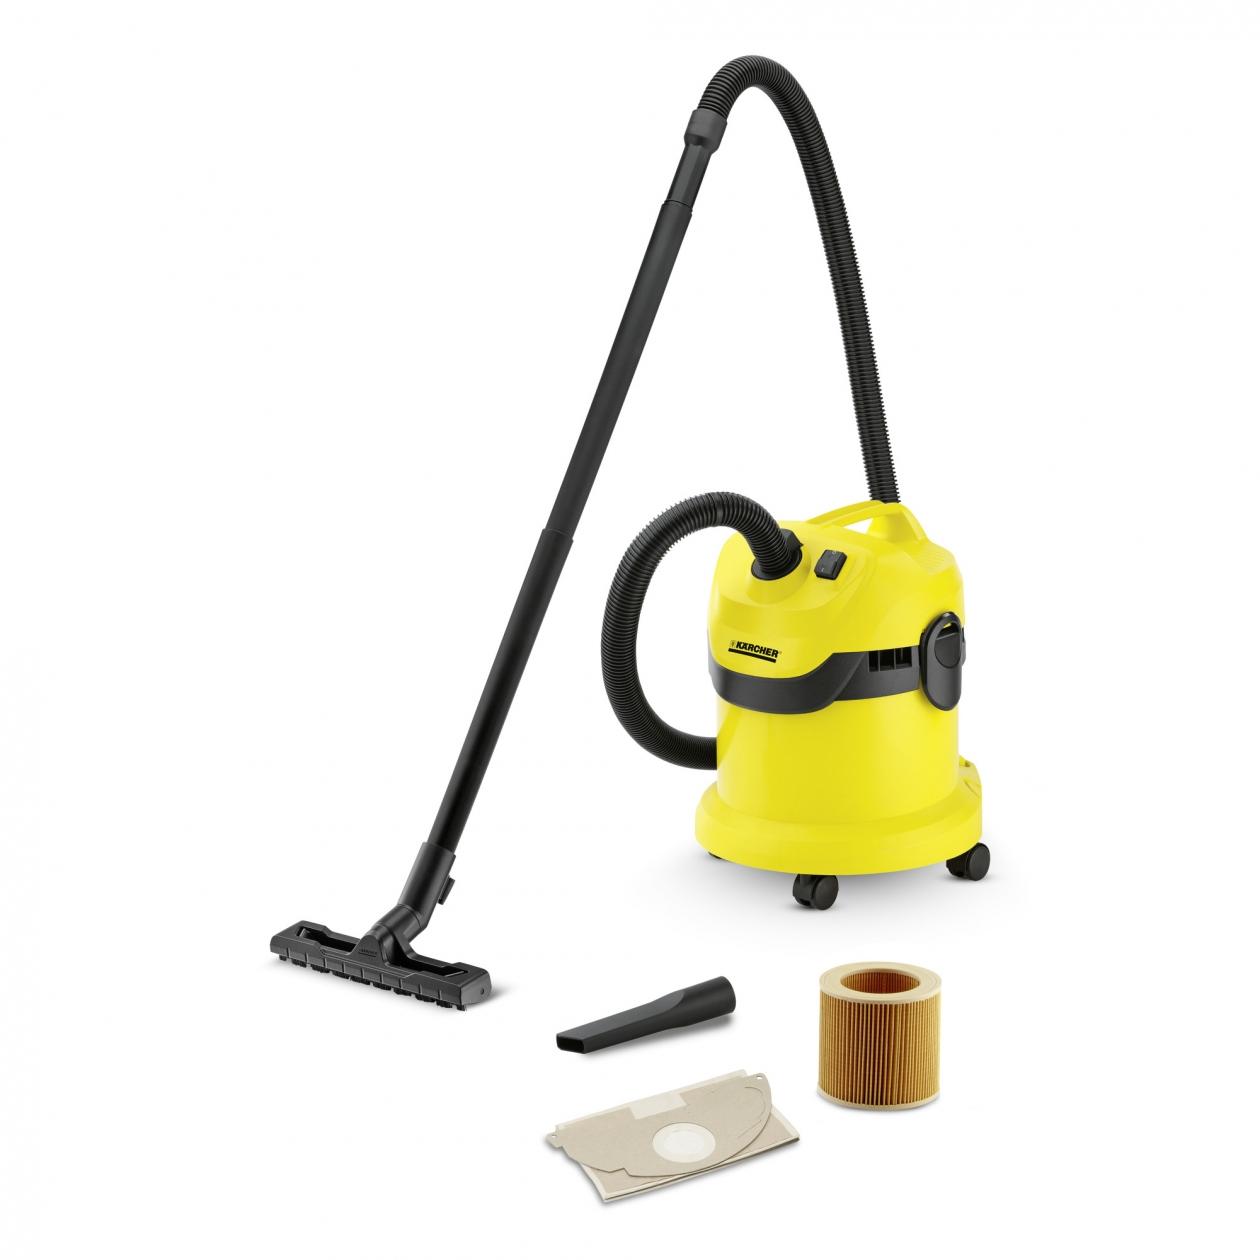 K5 Premium Full Control Plus Home Pressure Washer Karcher Centre Drainage Pump Sp 3 Dirt Wd2 Wet Dry Vacuum Cleaner